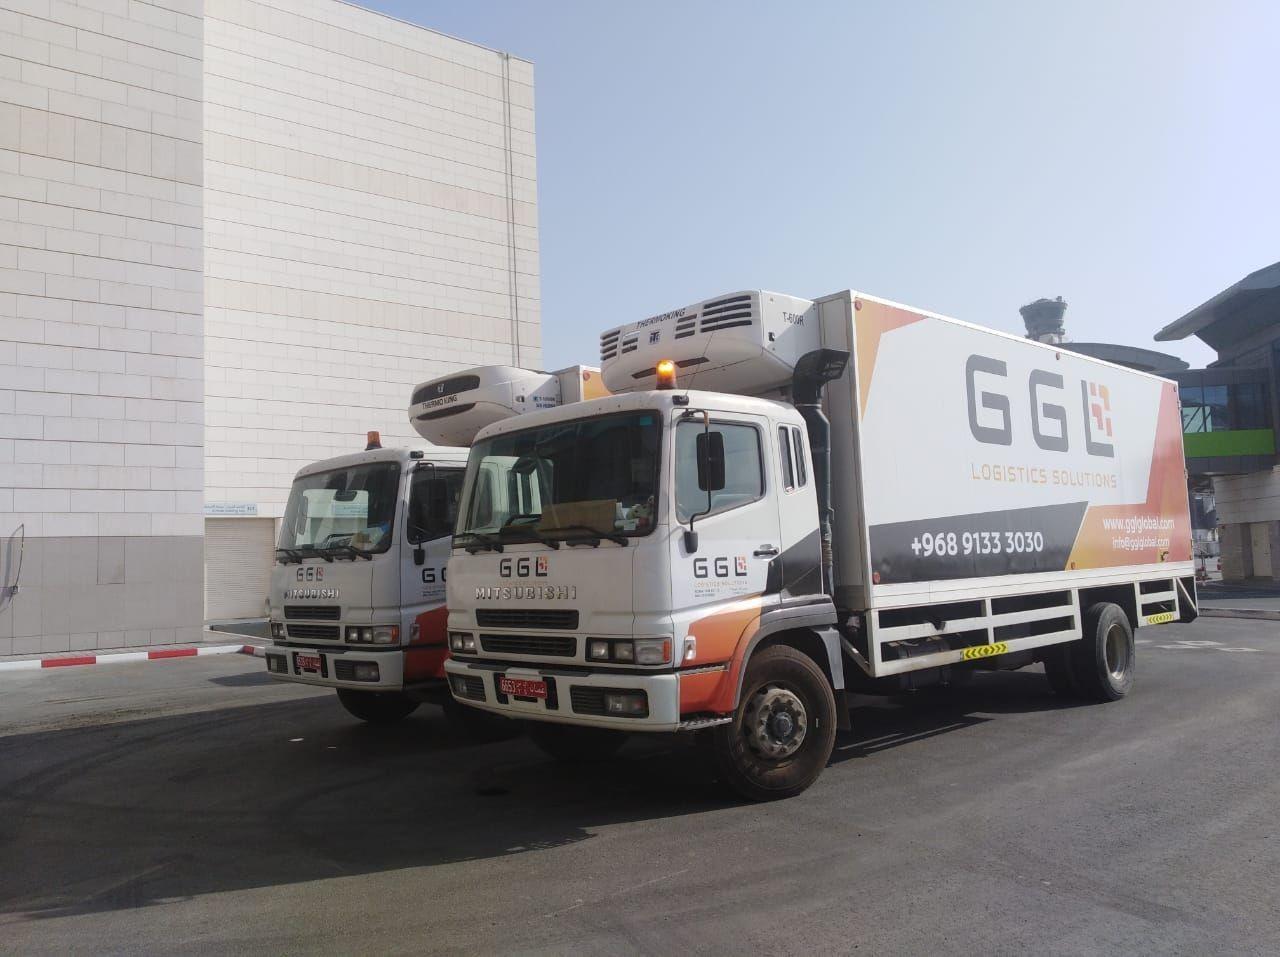 GGL - Logistics Solutions   LinkedIn